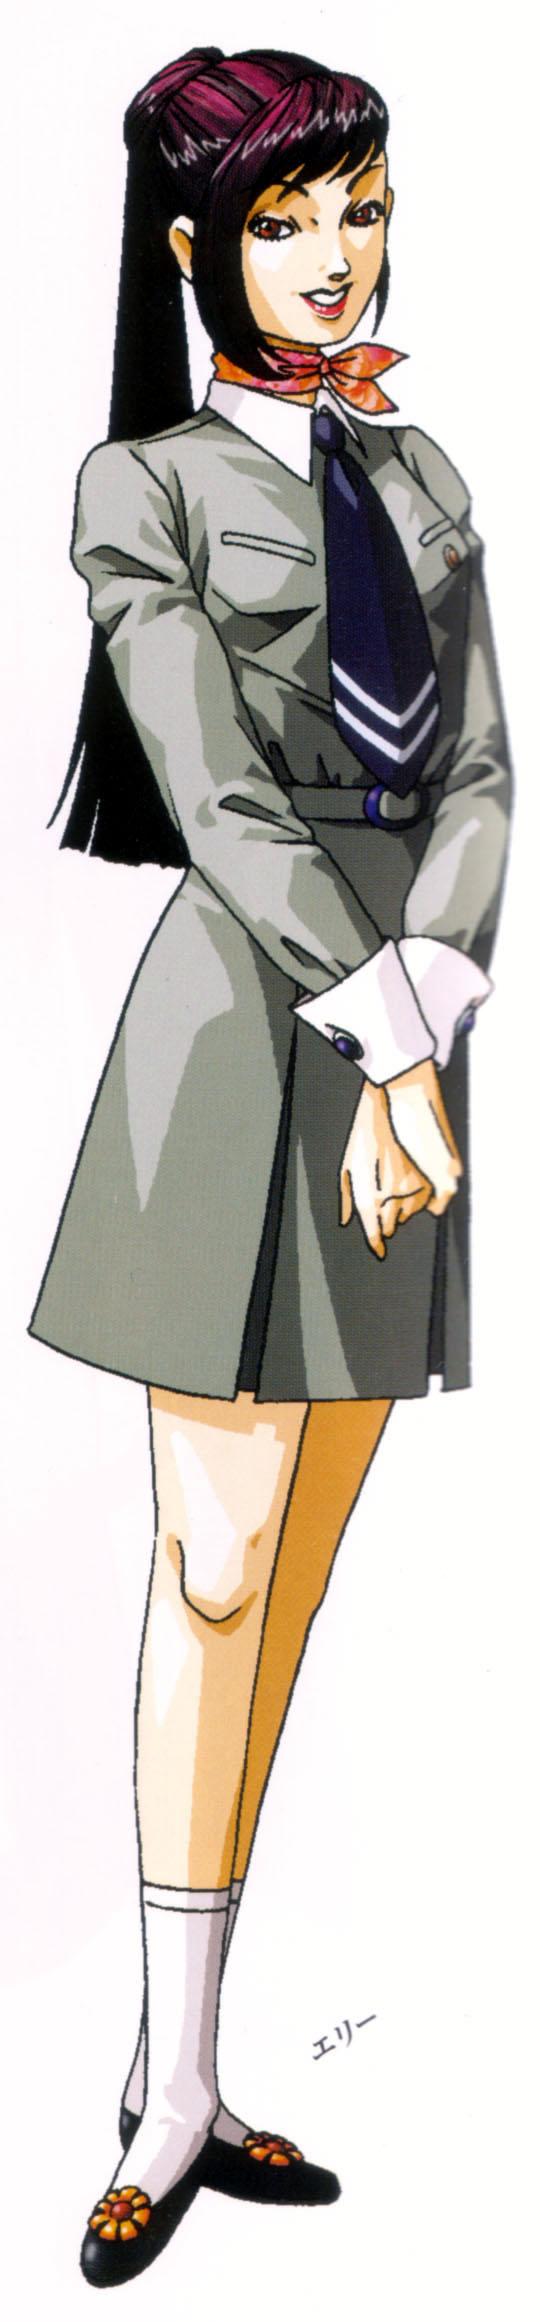 Eriko Kirishima